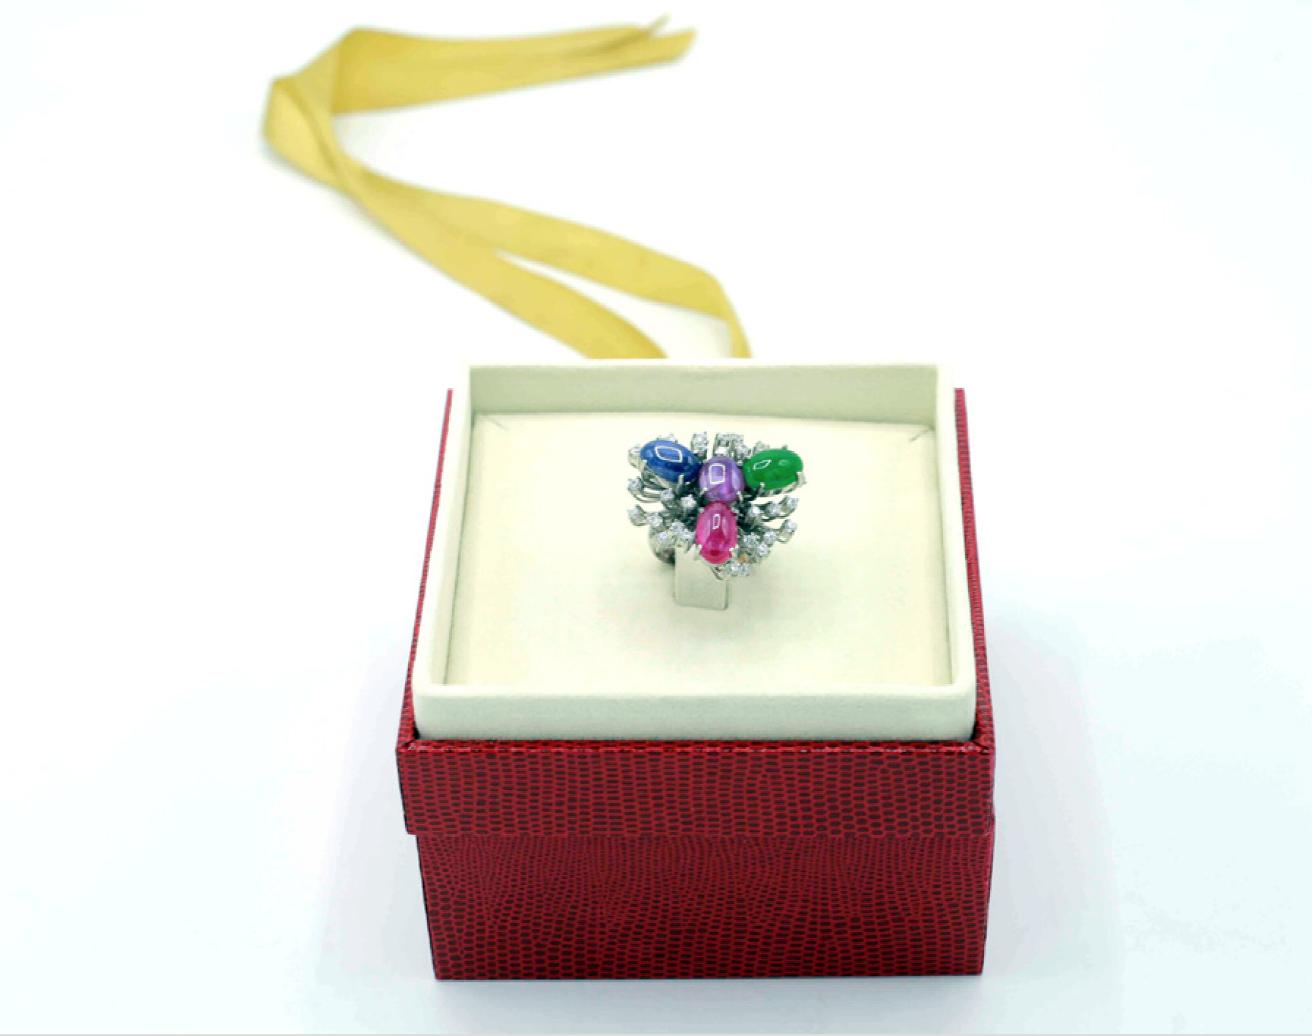 C05004 แหวนดอกไม้ เทอดมณี